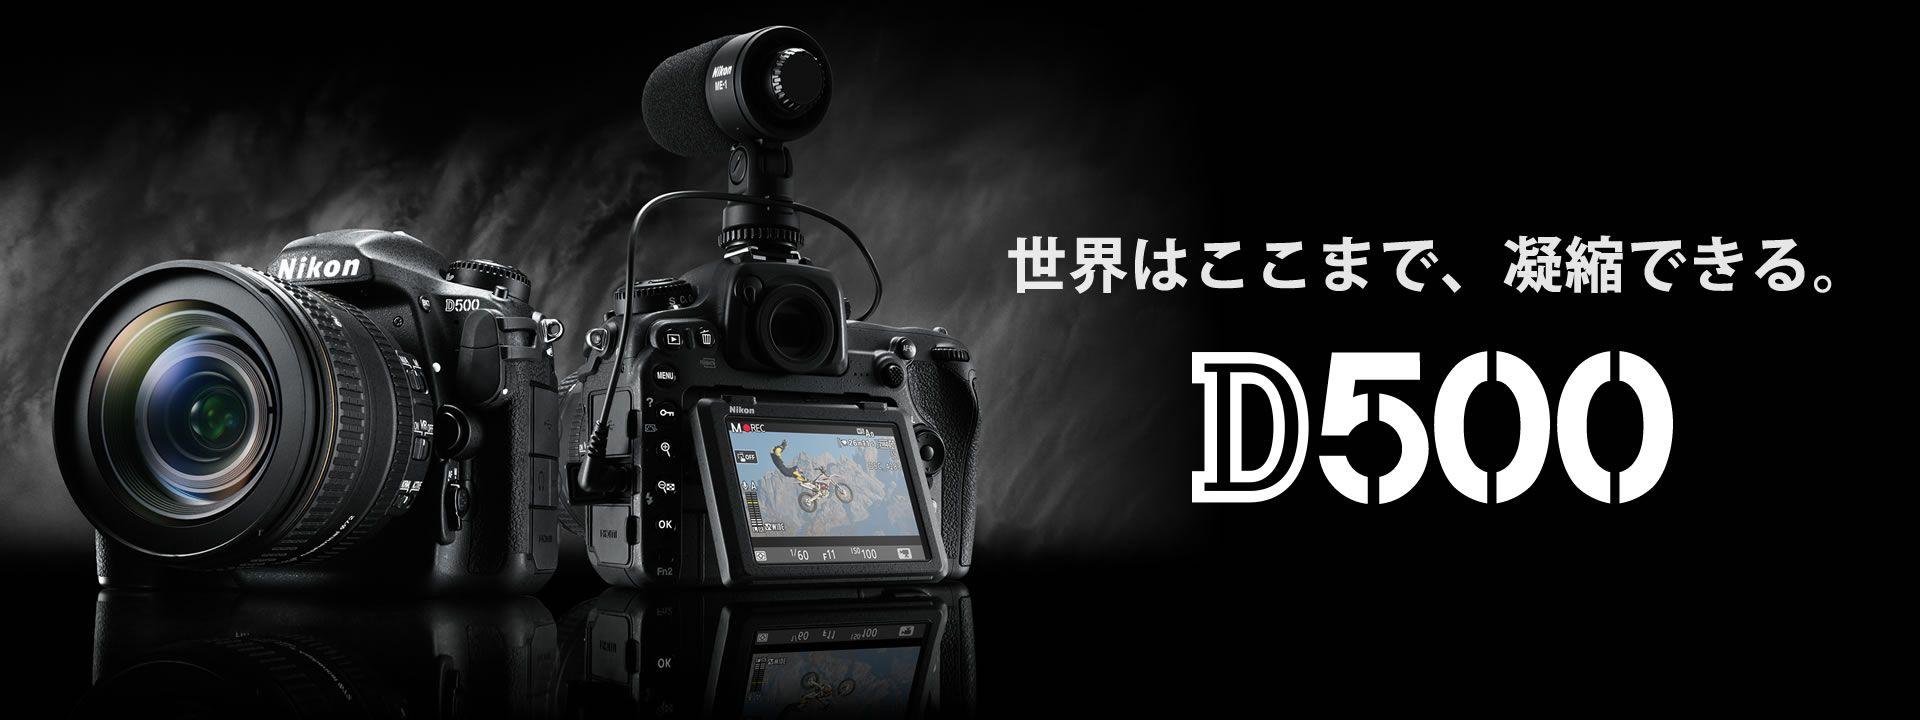 Nikon D500 For Wedding Photography: ニコン 一眼レフカメラ D500